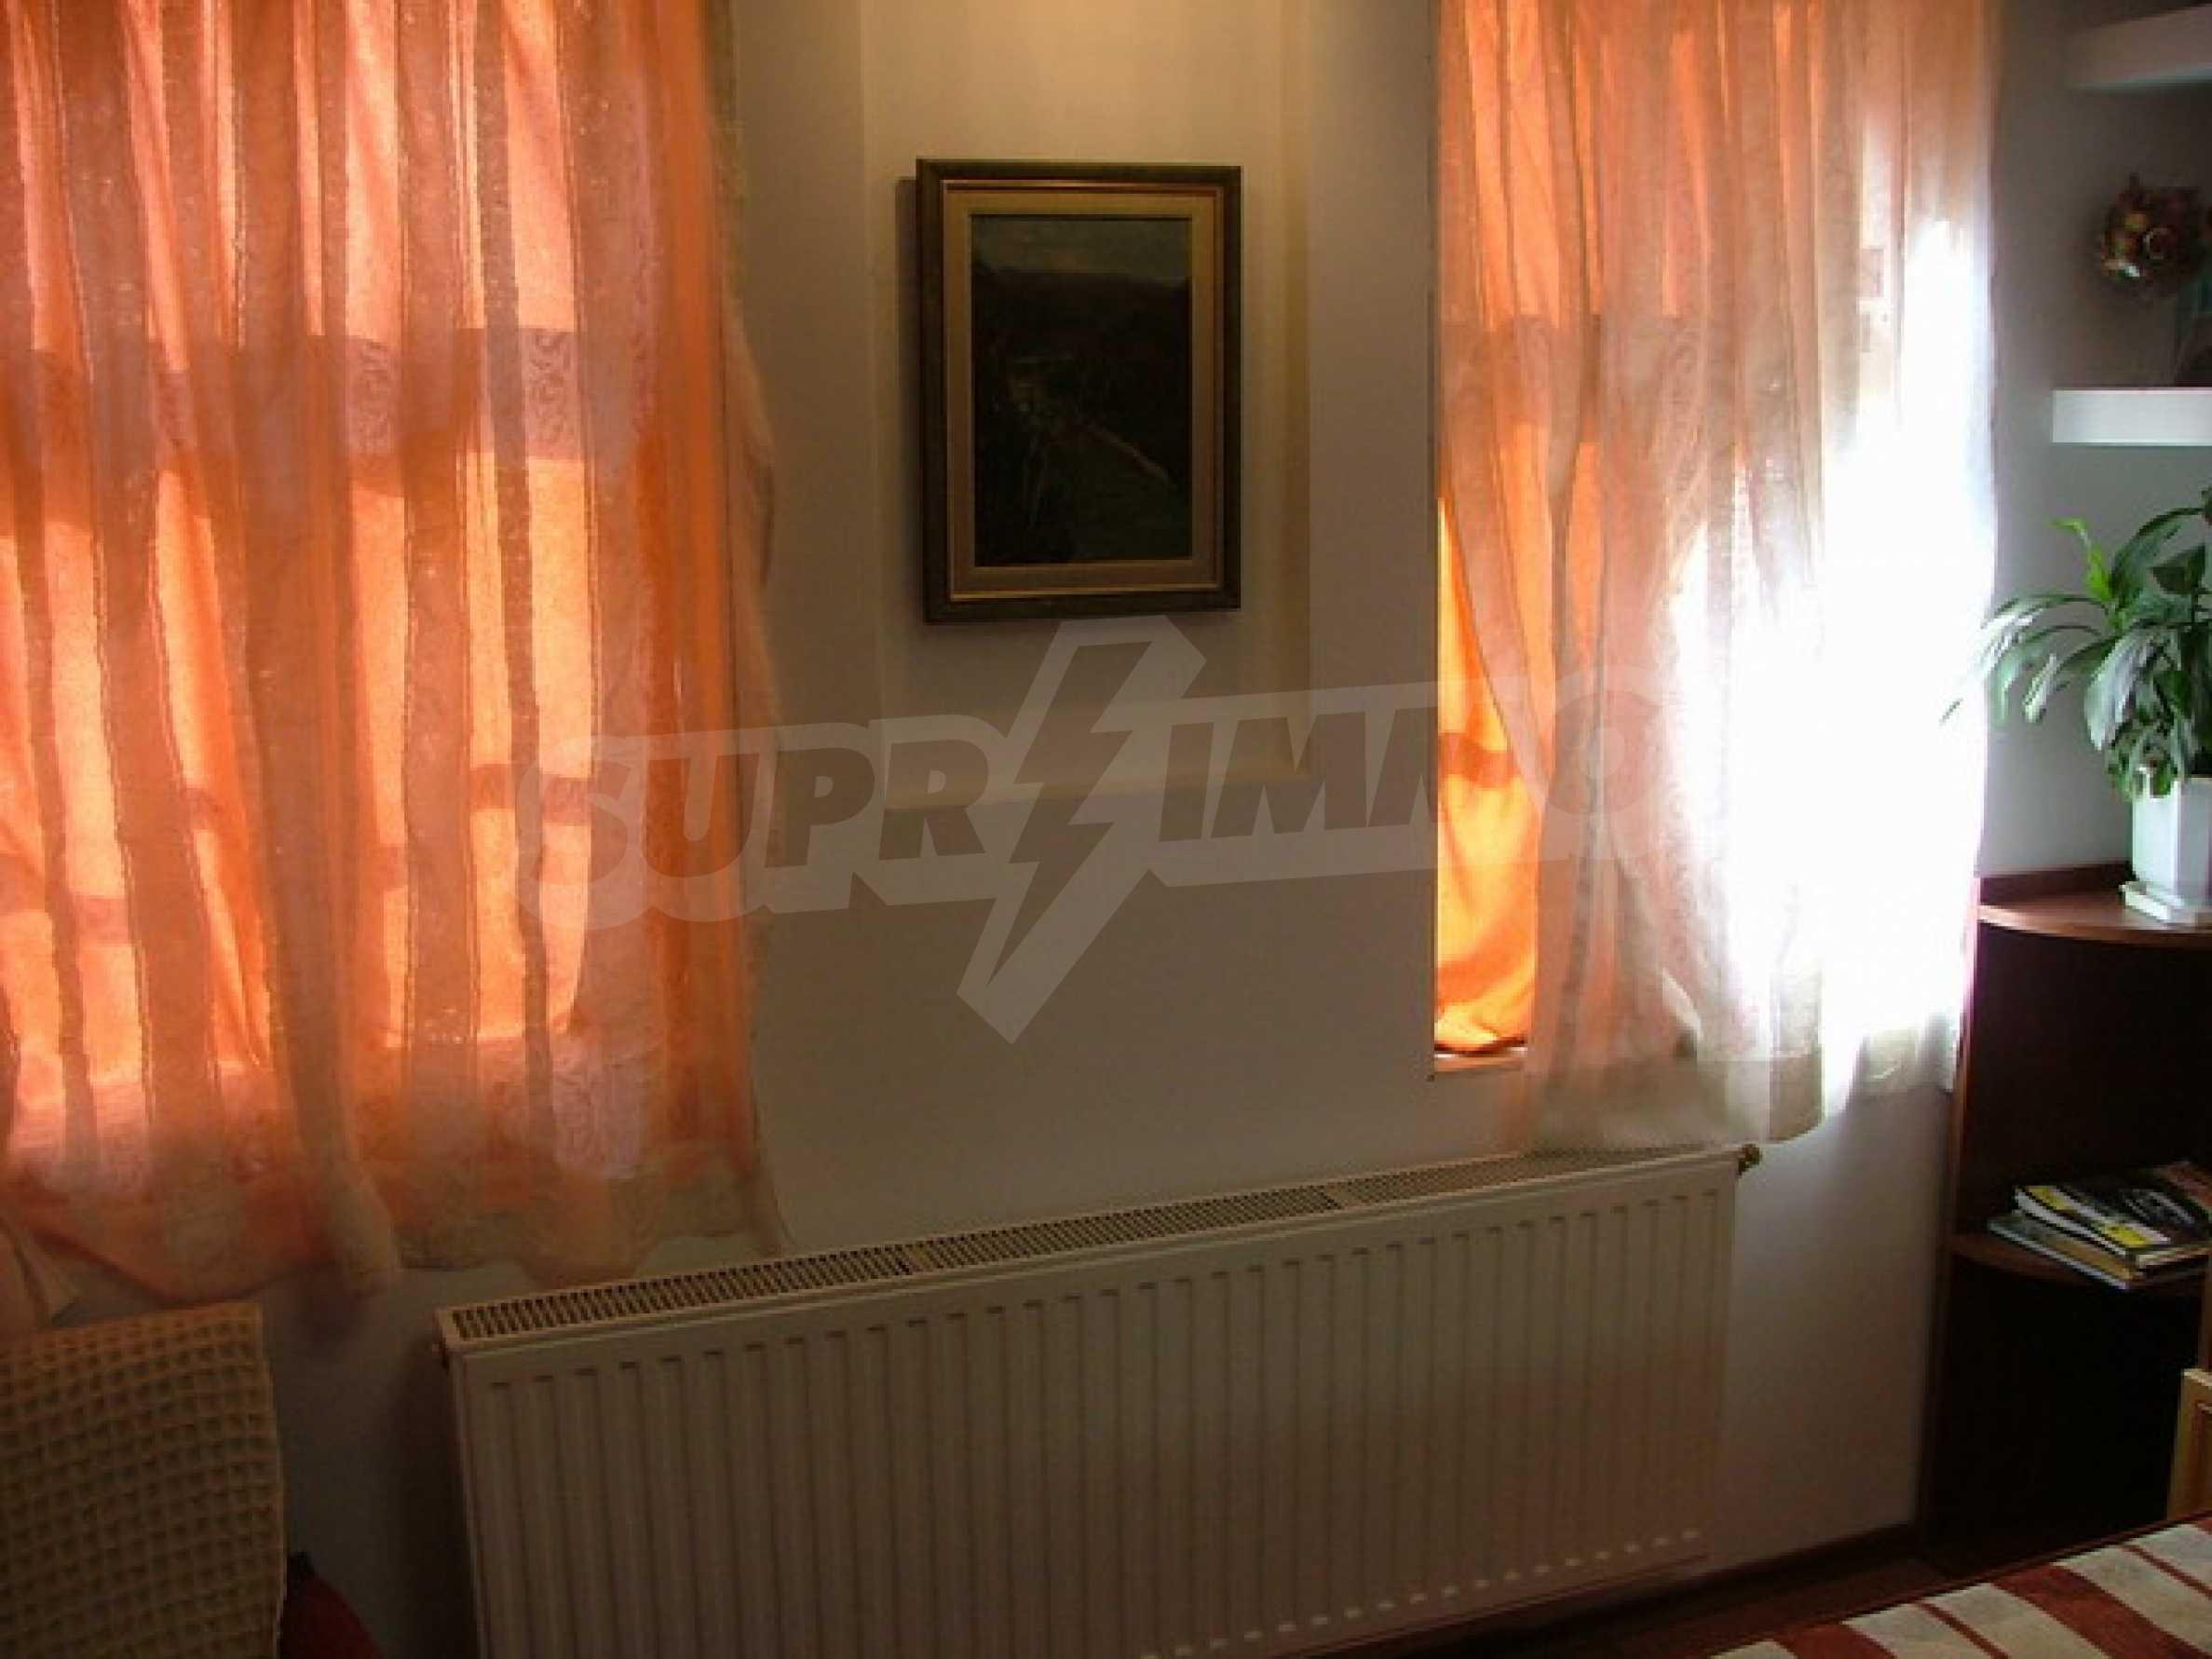 Stilvoll renovierte Villa 12 km entfernt. von Veliko Tarnovo 11